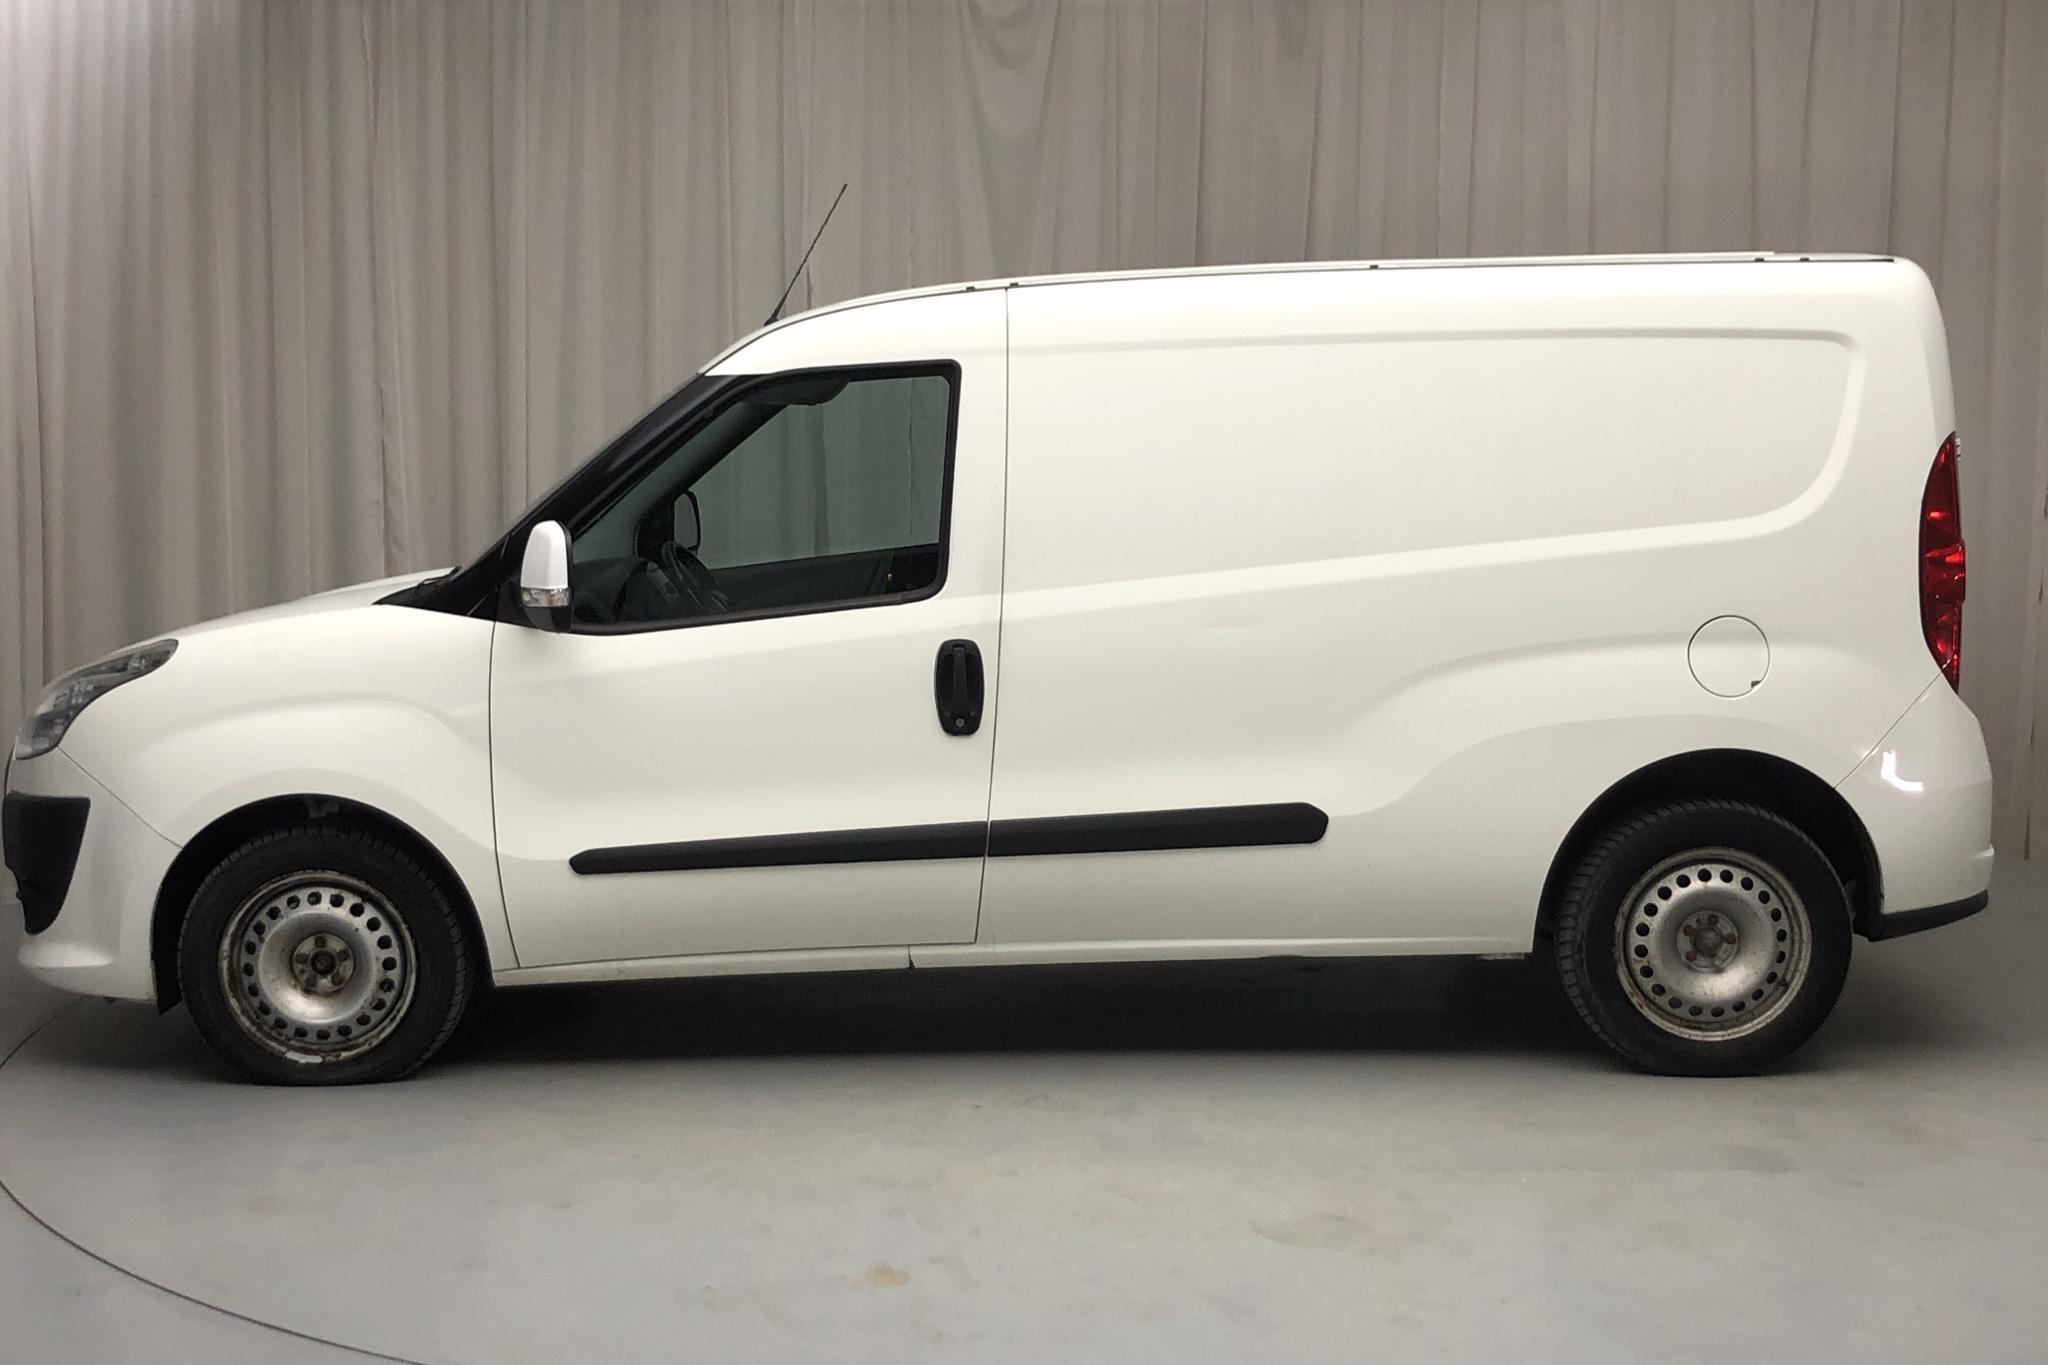 Fiat Doblo Cargo 1.4 CNG (95hk) - 12 172 mil - Manuell - vit - 2011